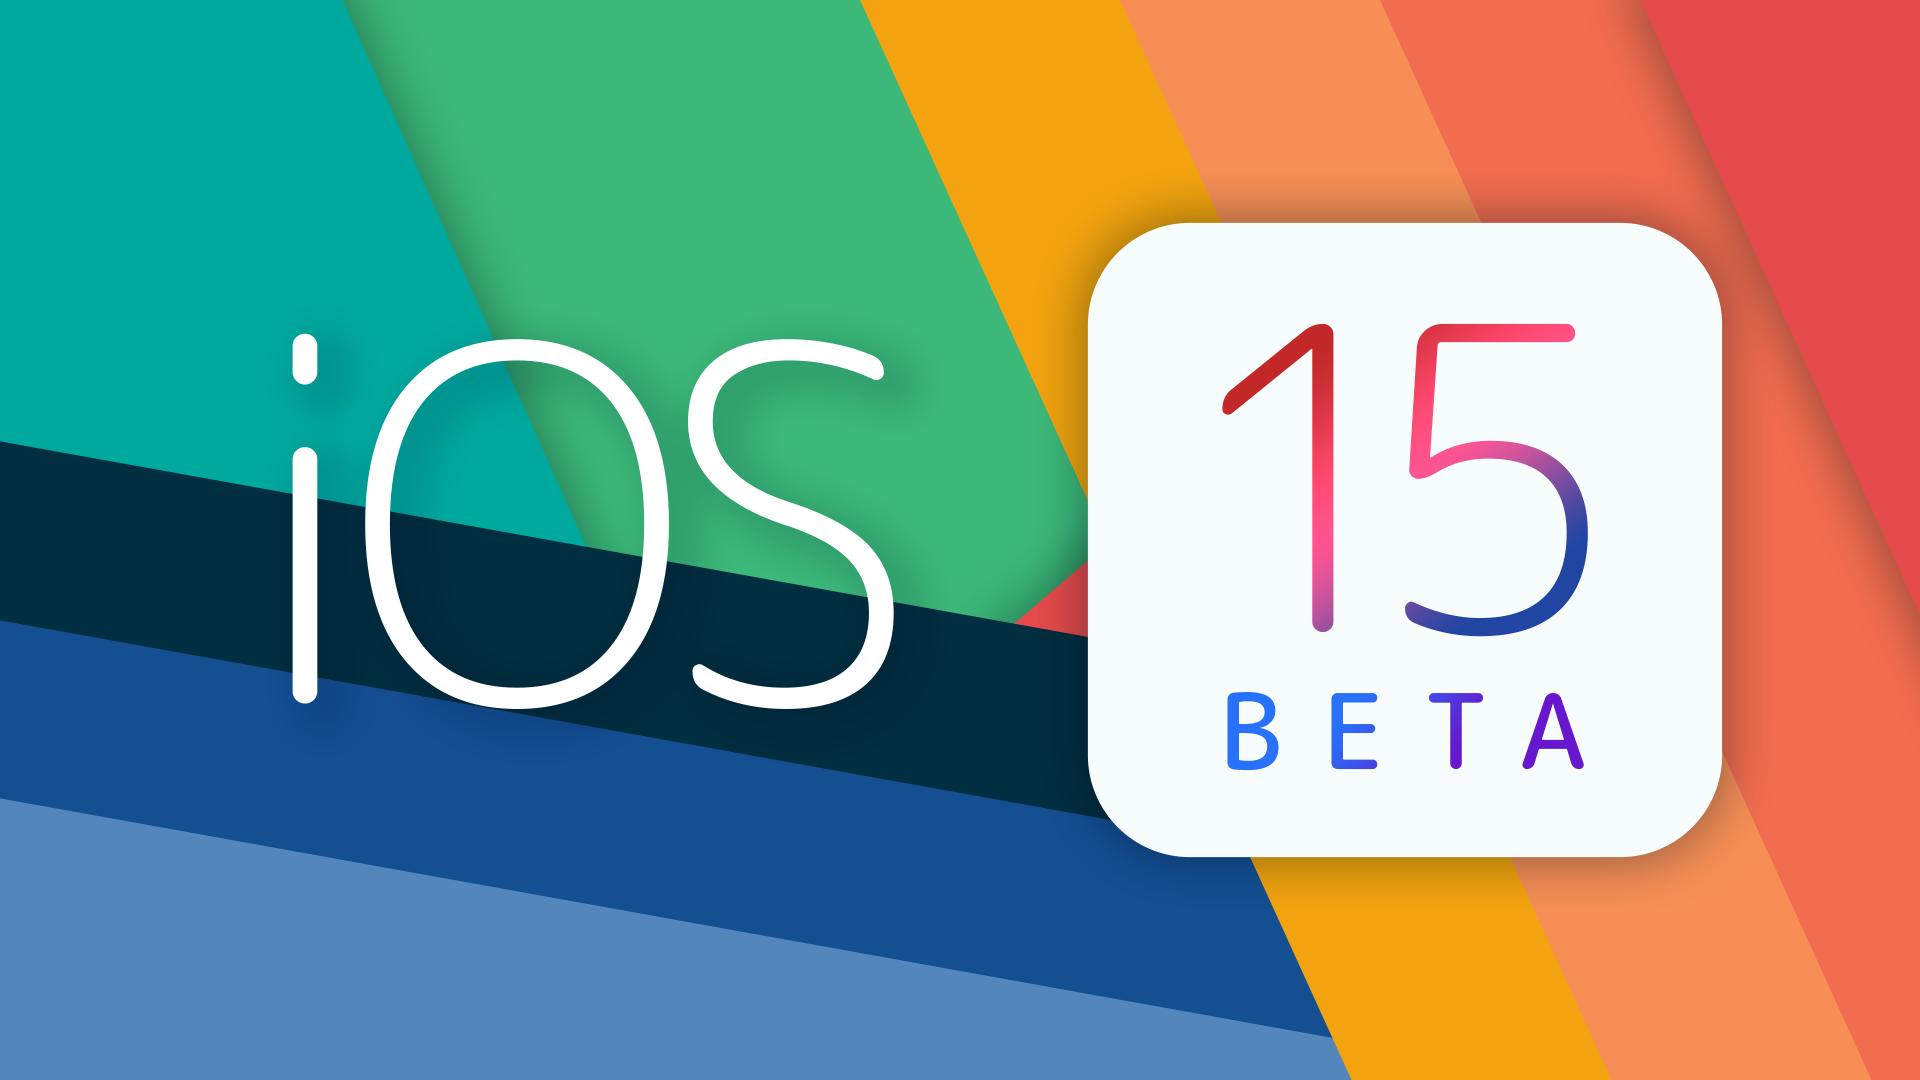 Betriebssystem, Apple, iOS, Beta, iPadOS, Apple iOS, Apple iPadOS, iOS Update, iOS 15, 15, iOS 15 Beta